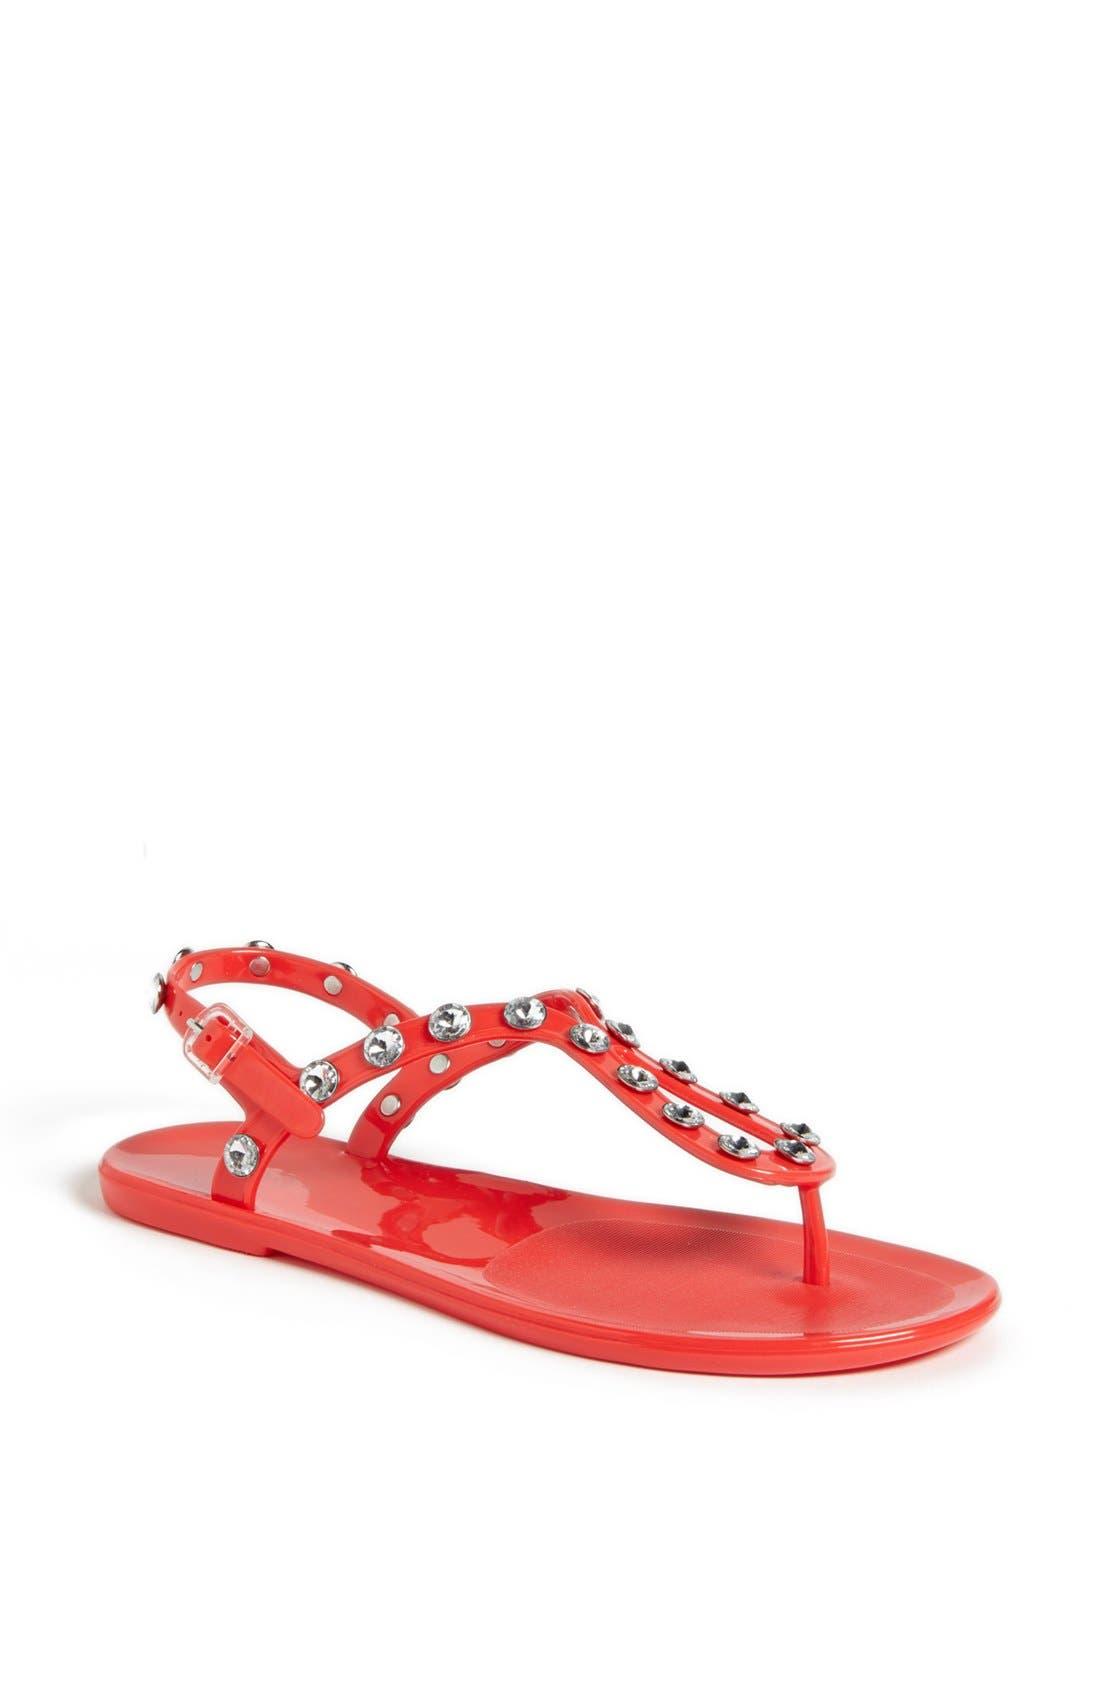 Main Image - Holster Fashion 'Supermodel' Jelly Thong Sandal